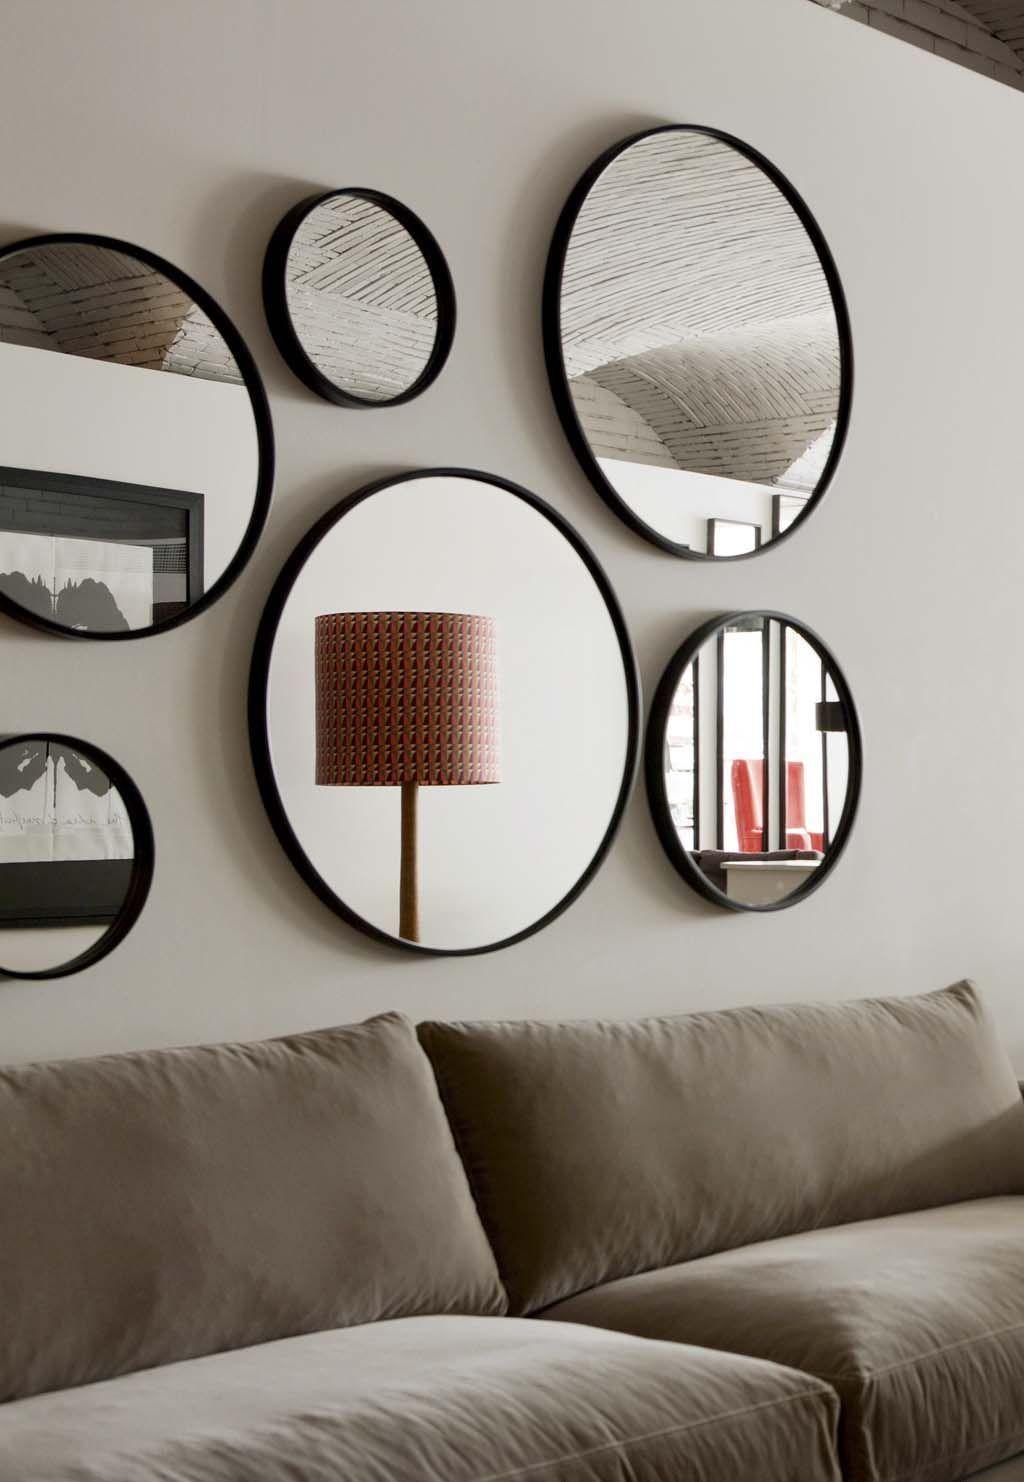 Sala de estar com moldura redonda preta